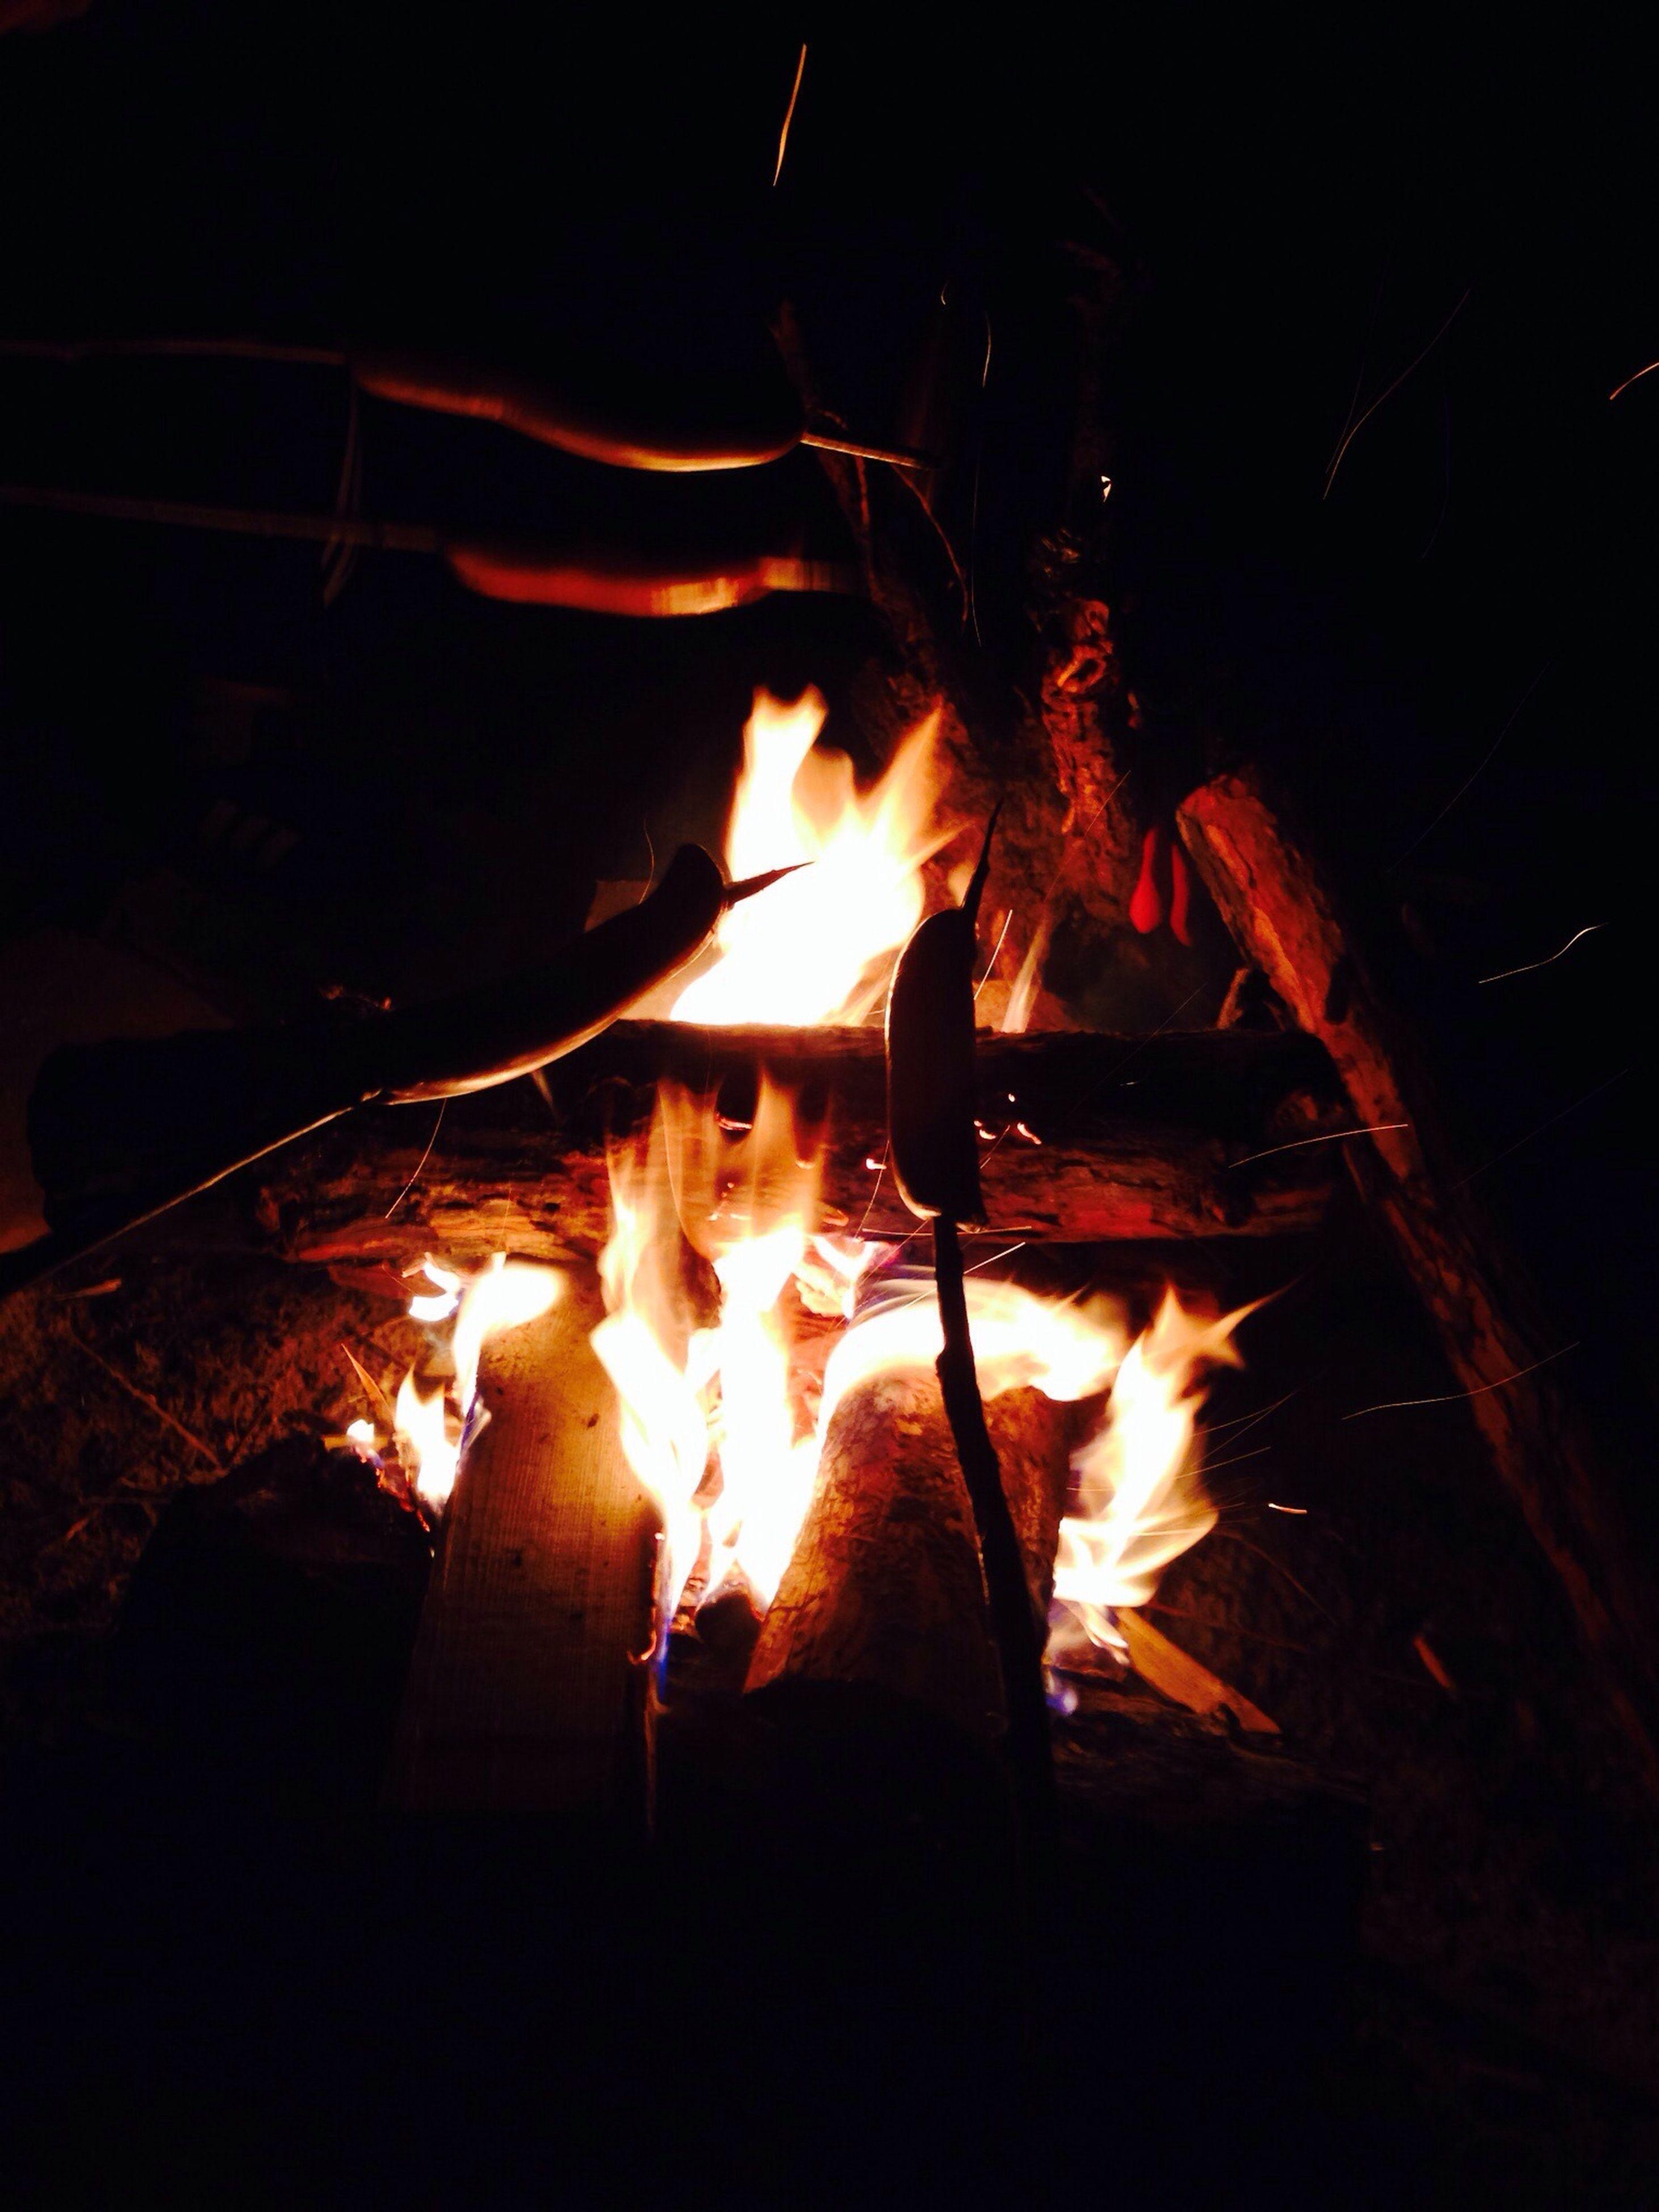 burning, flame, fire - natural phenomenon, heat - temperature, night, bonfire, glowing, fire, firewood, campfire, heat, illuminated, motion, dark, wood - material, orange color, fireplace, close-up, light - natural phenomenon, indoors